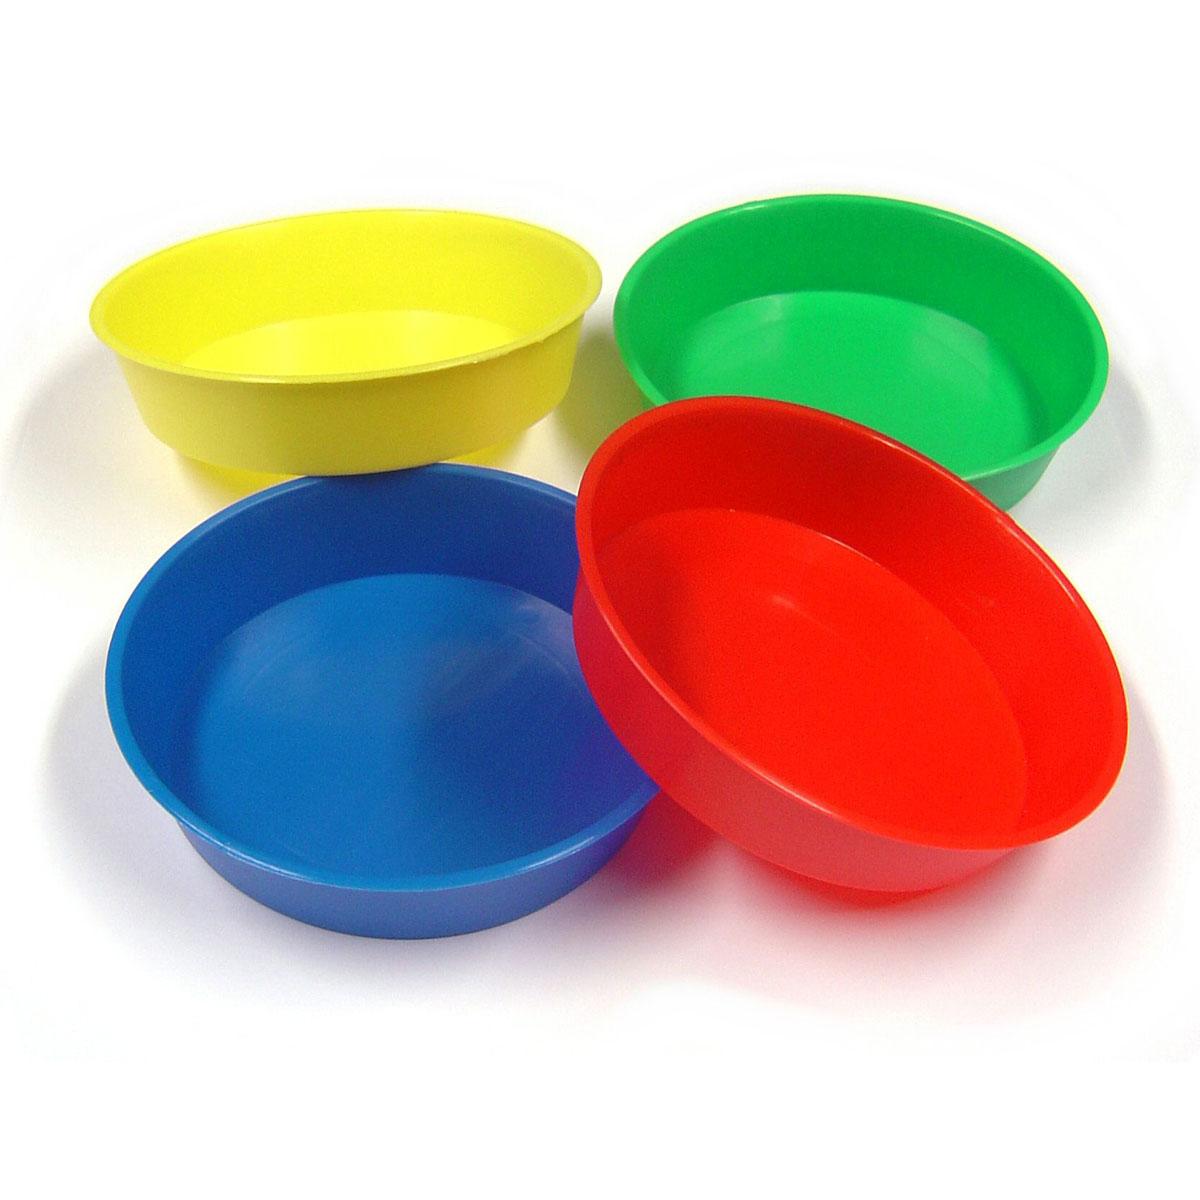 Plastic Bowls - Set of 4 MB7015-4 | Primary ICT